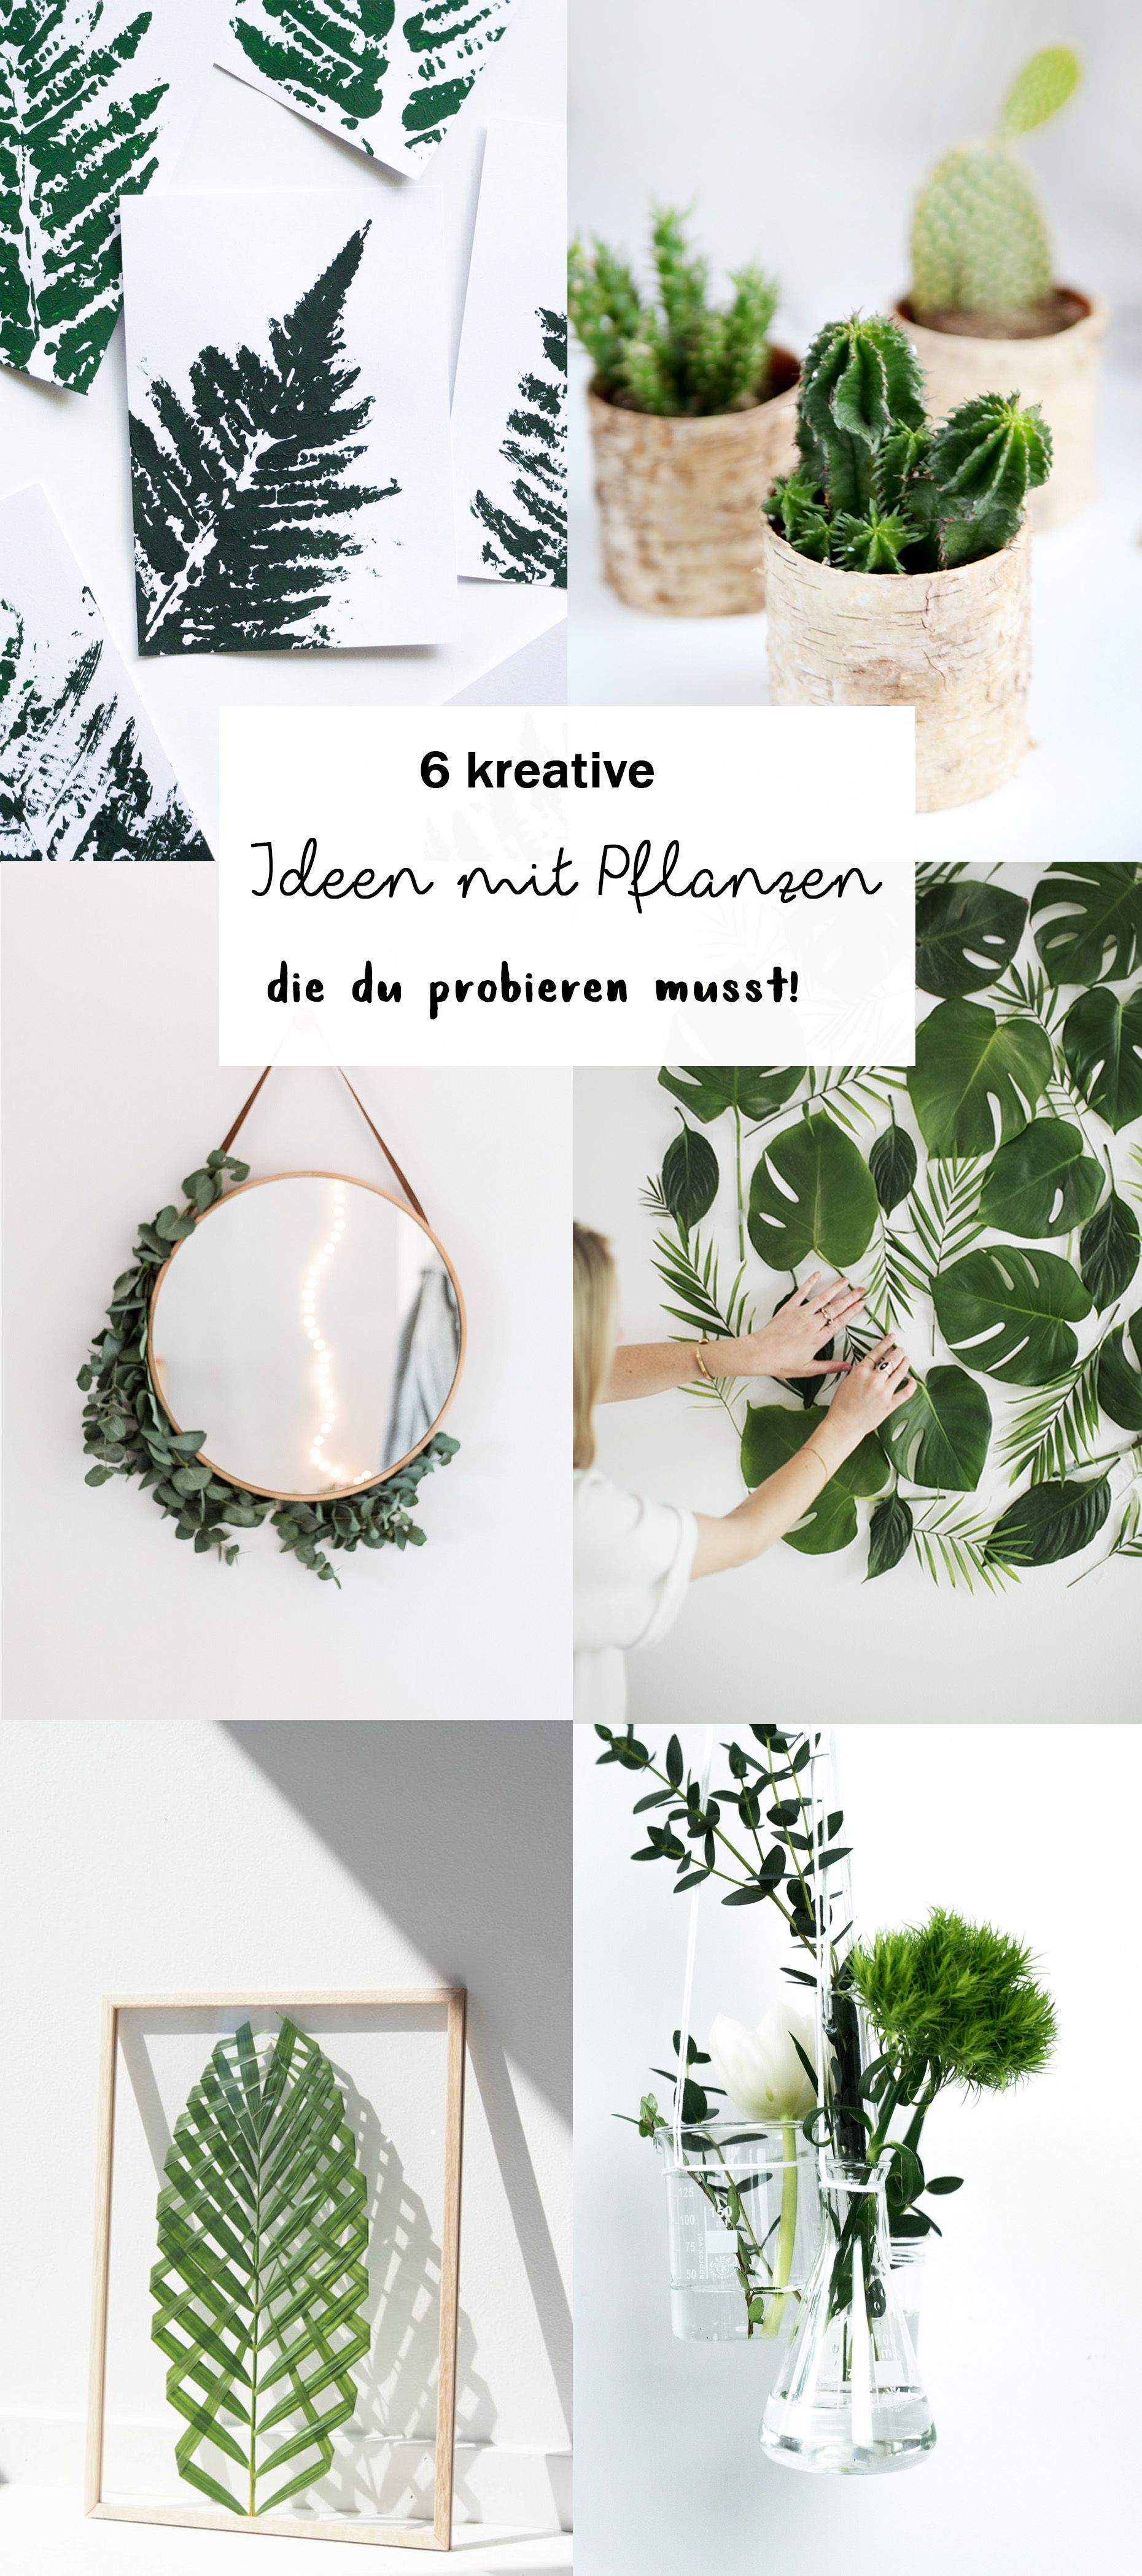 6 kreative ideen f r pflanzen deko crafts deko. Black Bedroom Furniture Sets. Home Design Ideas